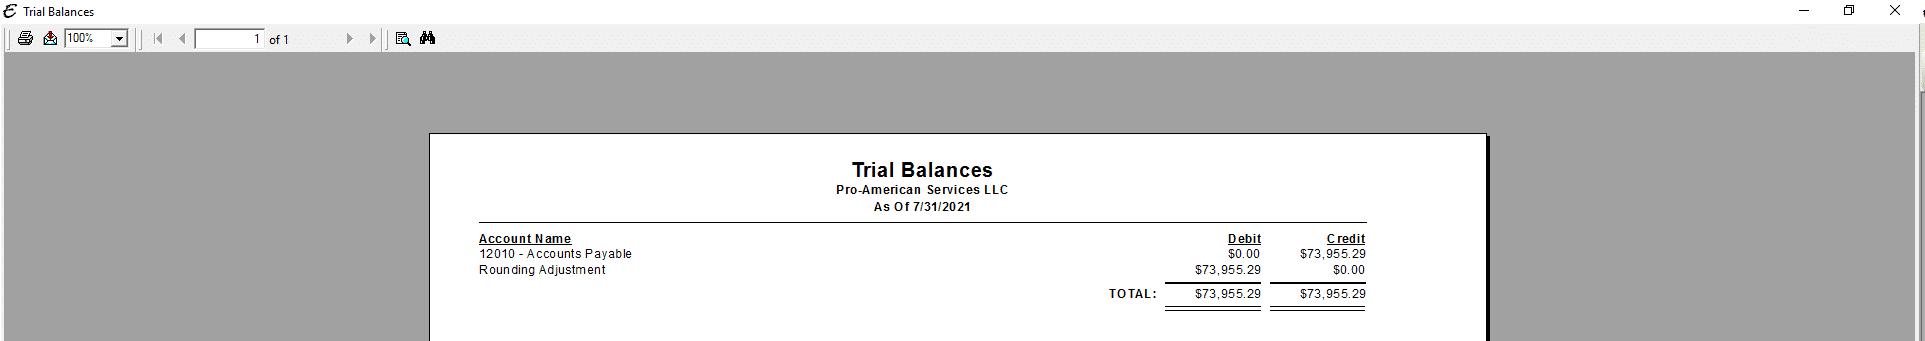 Trial Balance Report PDF